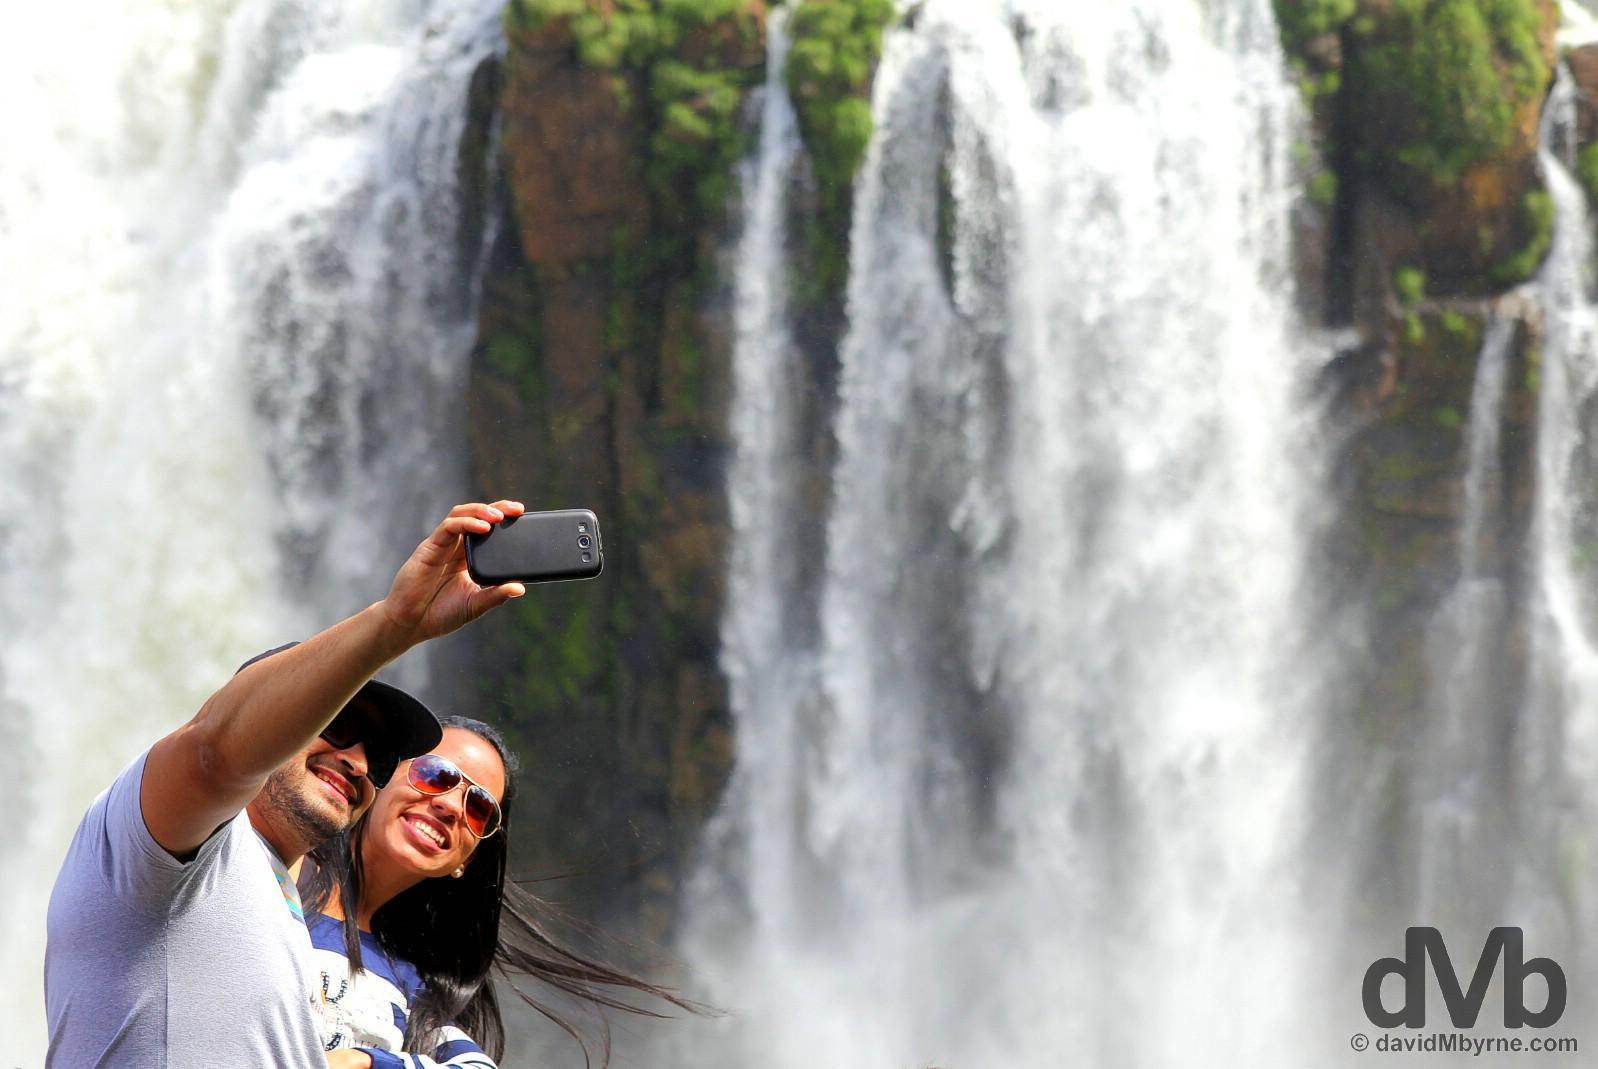 Couple selfie at Iguazu Falls in Parque Nacional Do Iguacu, Brazil. September 12, 2015.